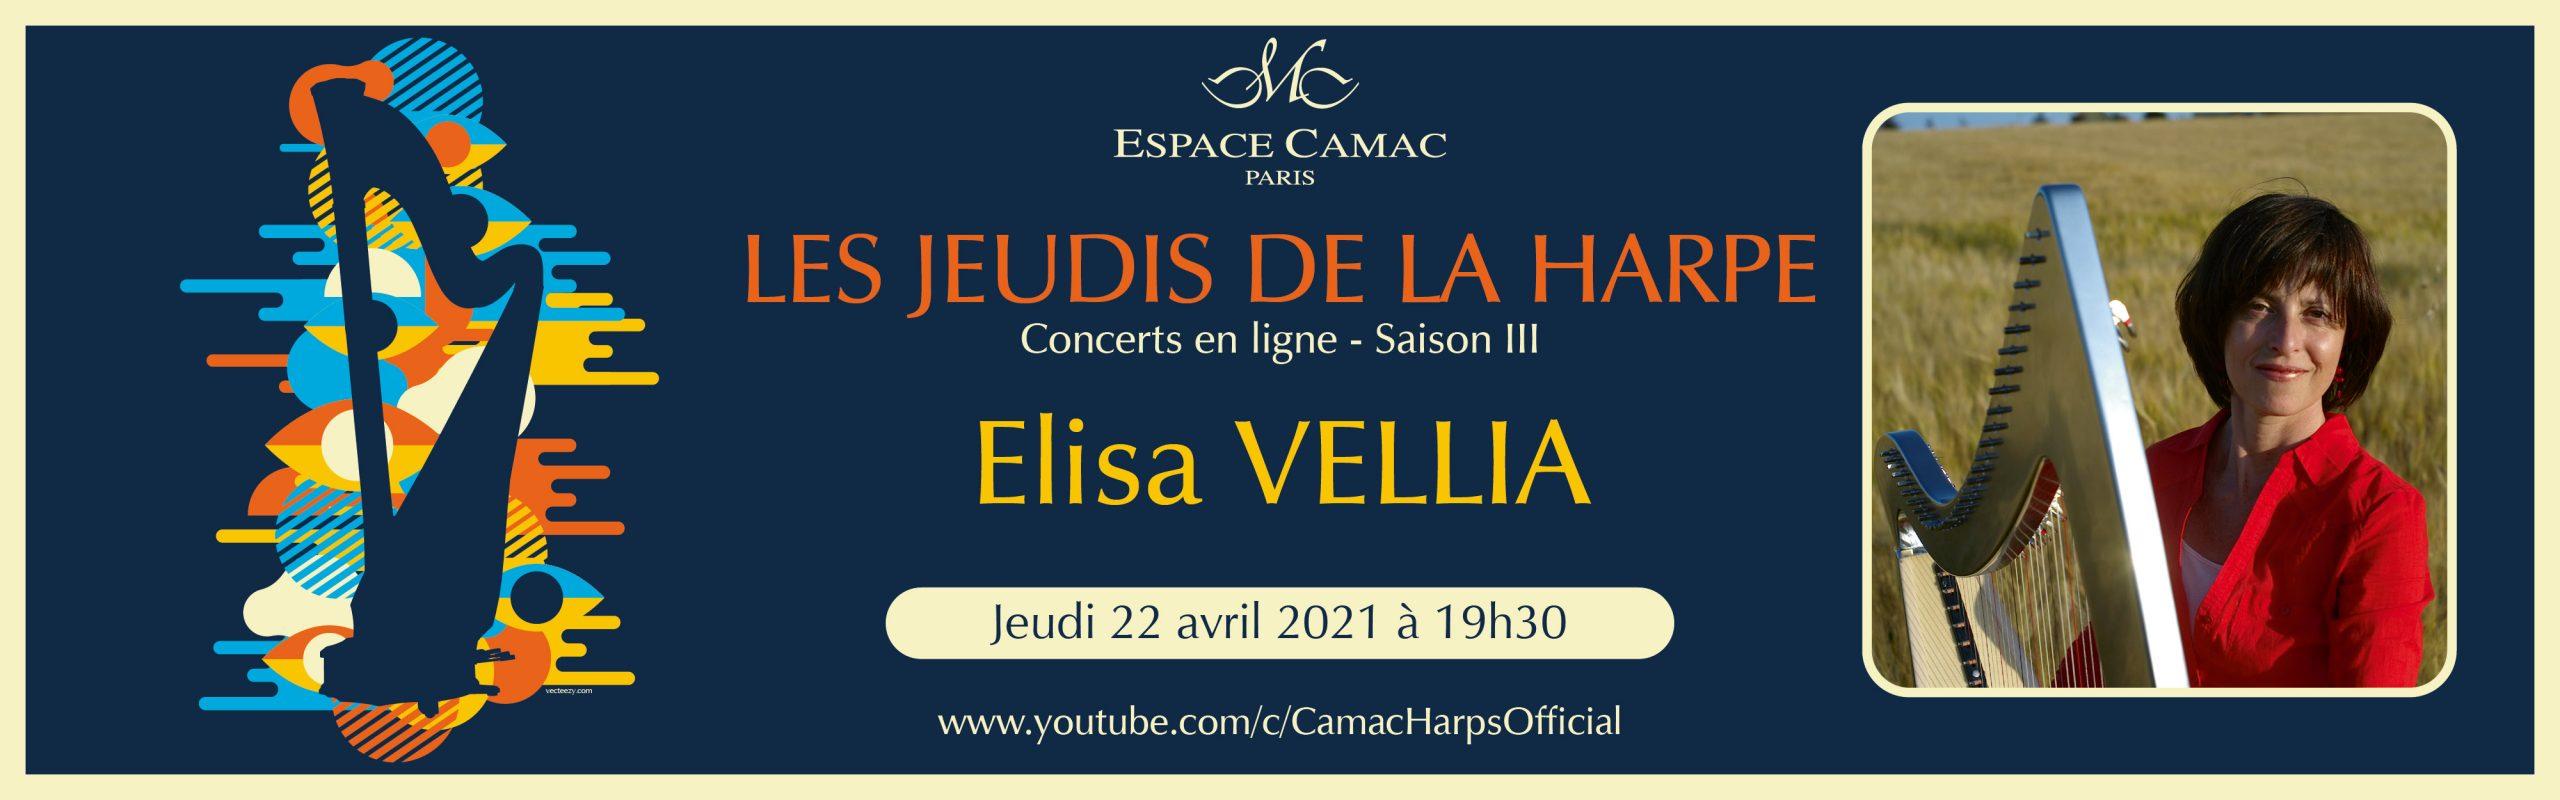 Les Jeudis de la Harpe : Elisa Vellia